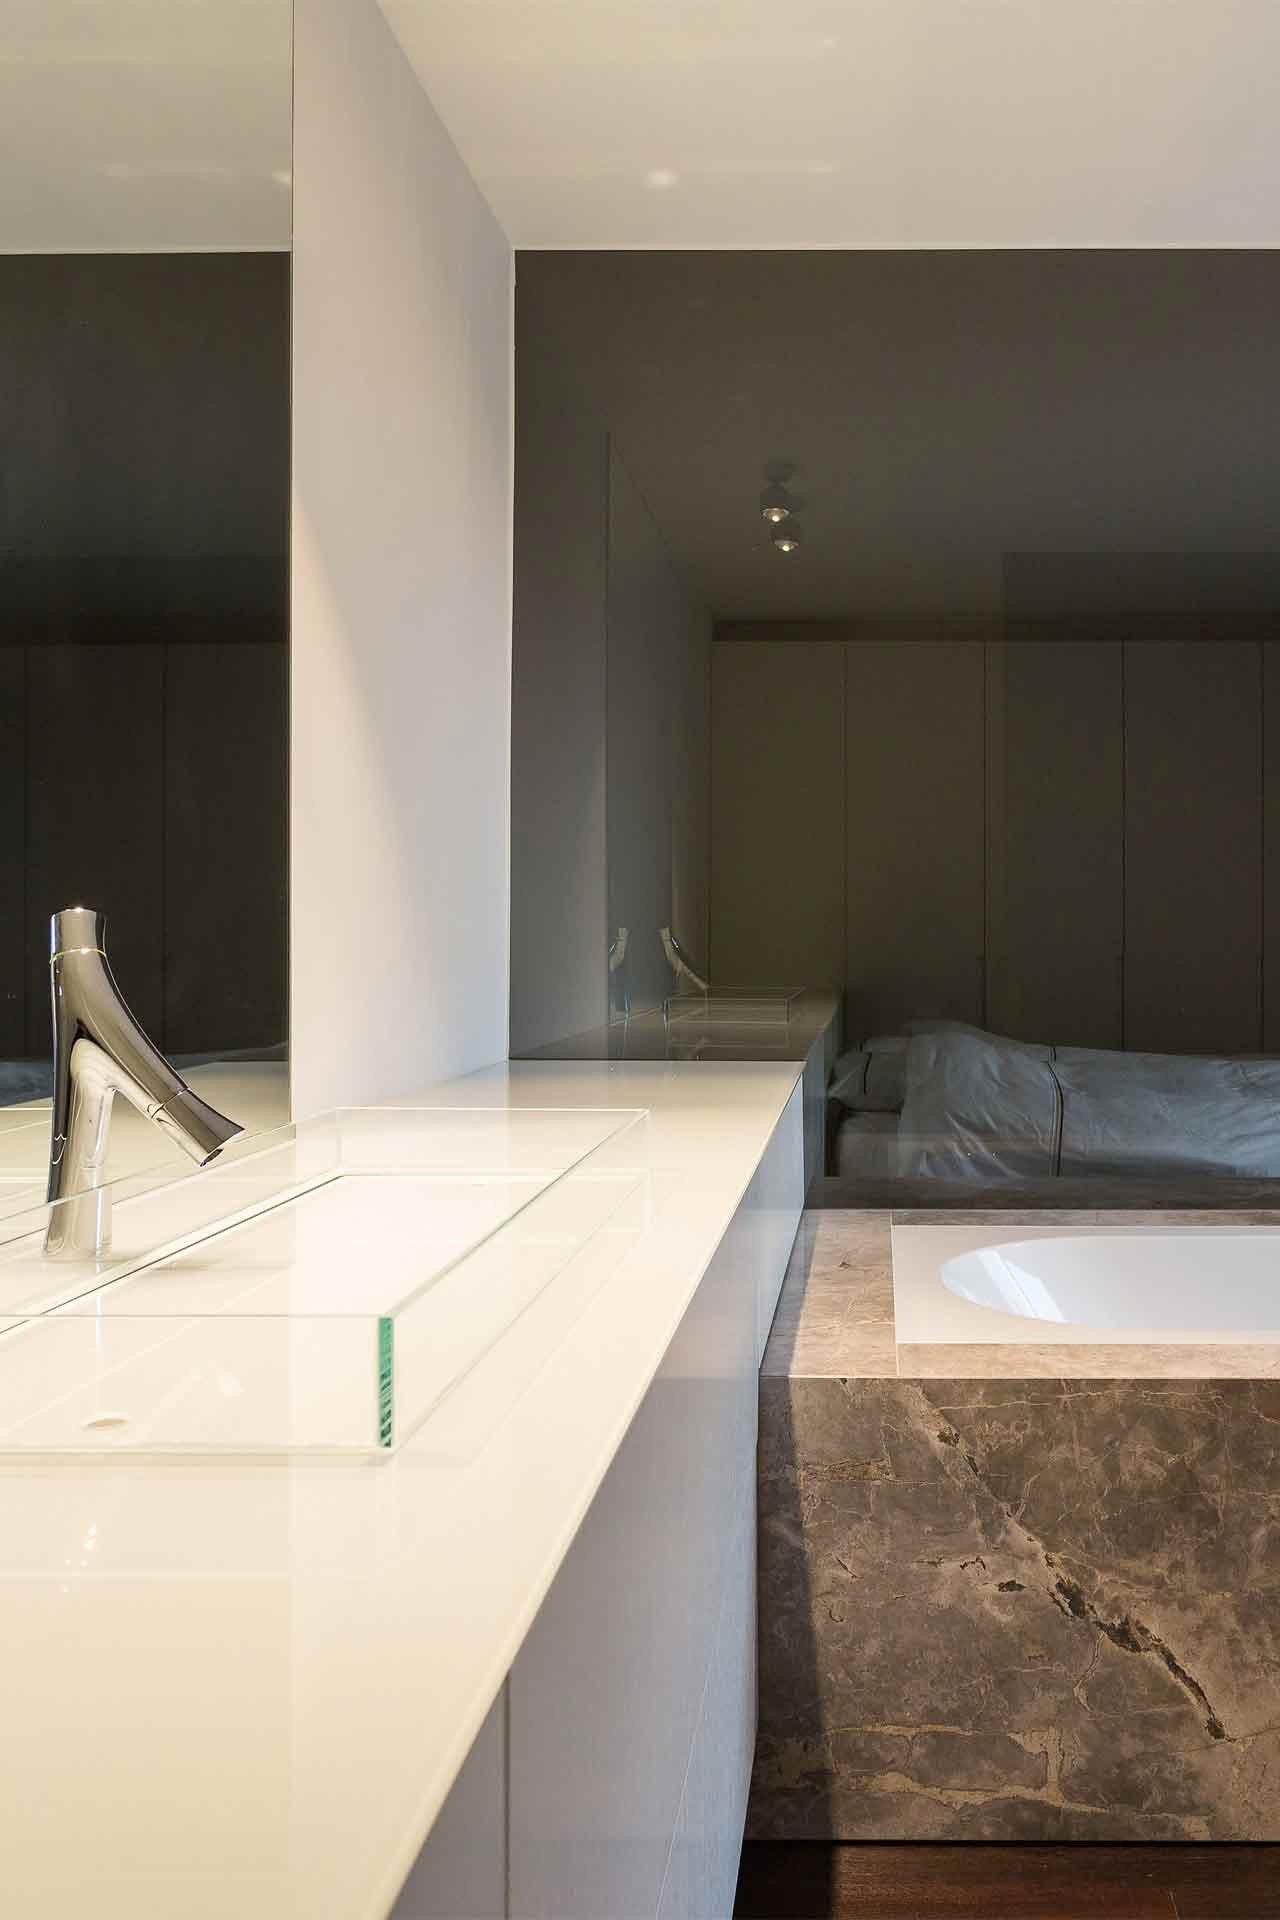 Totaalinrichting-badkamer-modern-SintMartenLatem-5.jpg